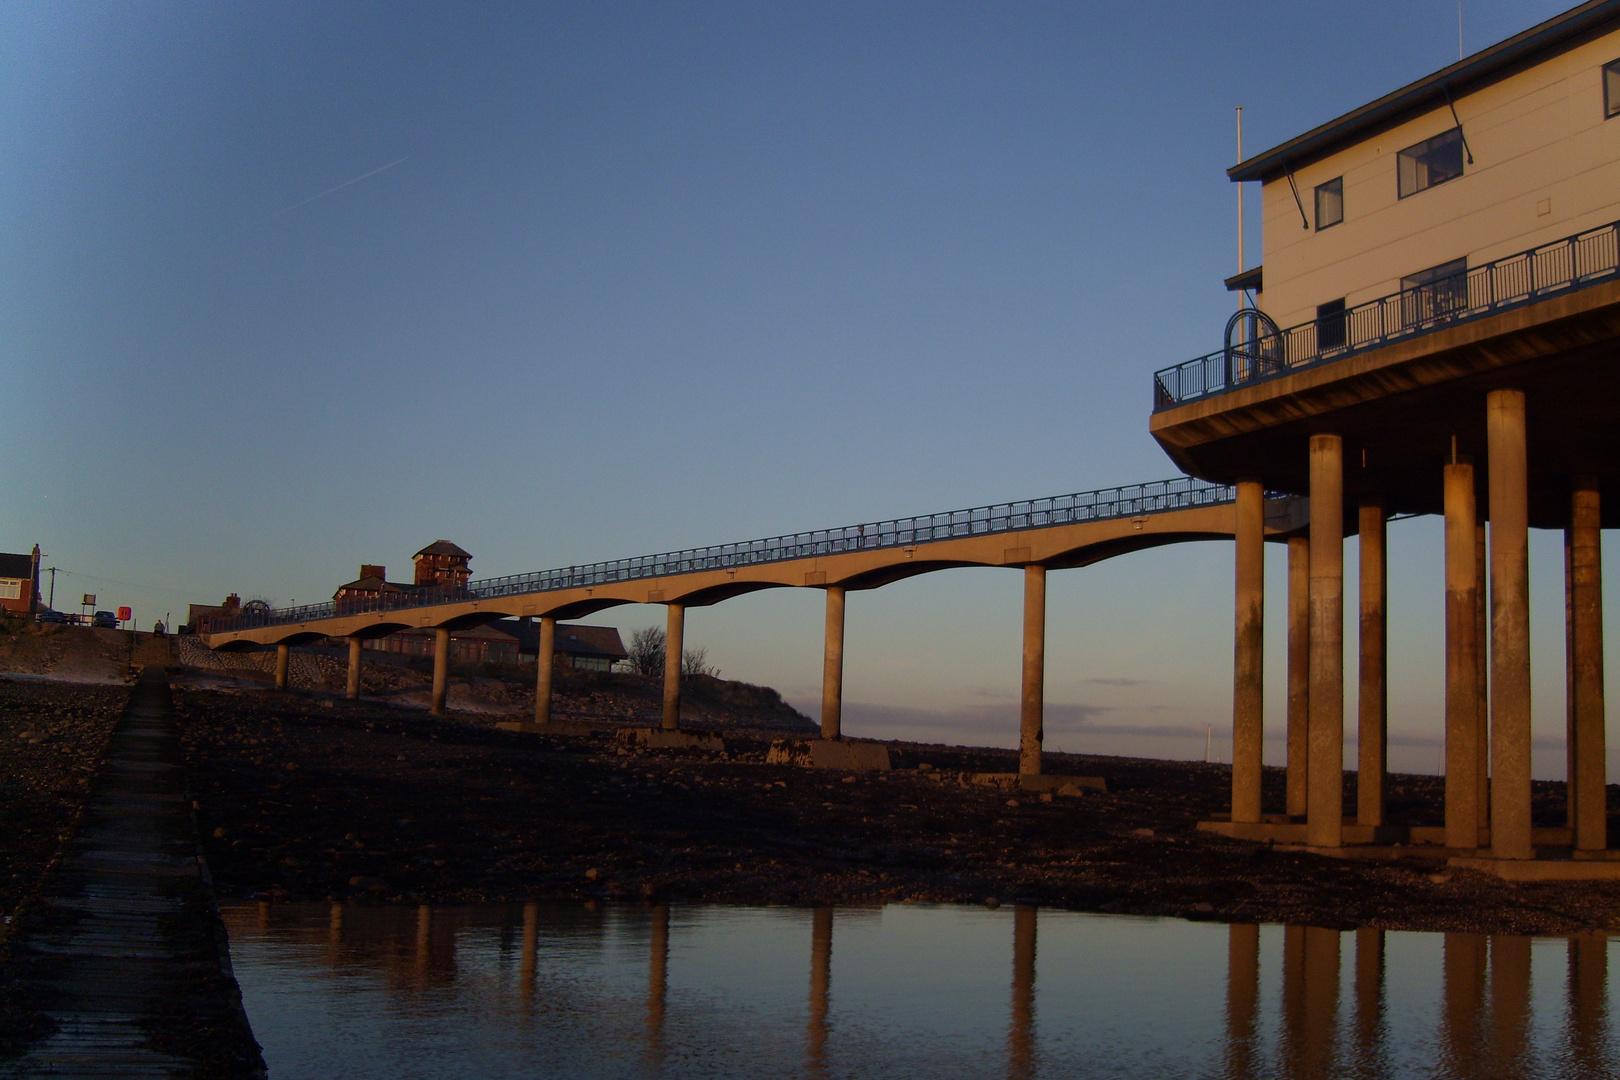 Andys' Bridge To Safety